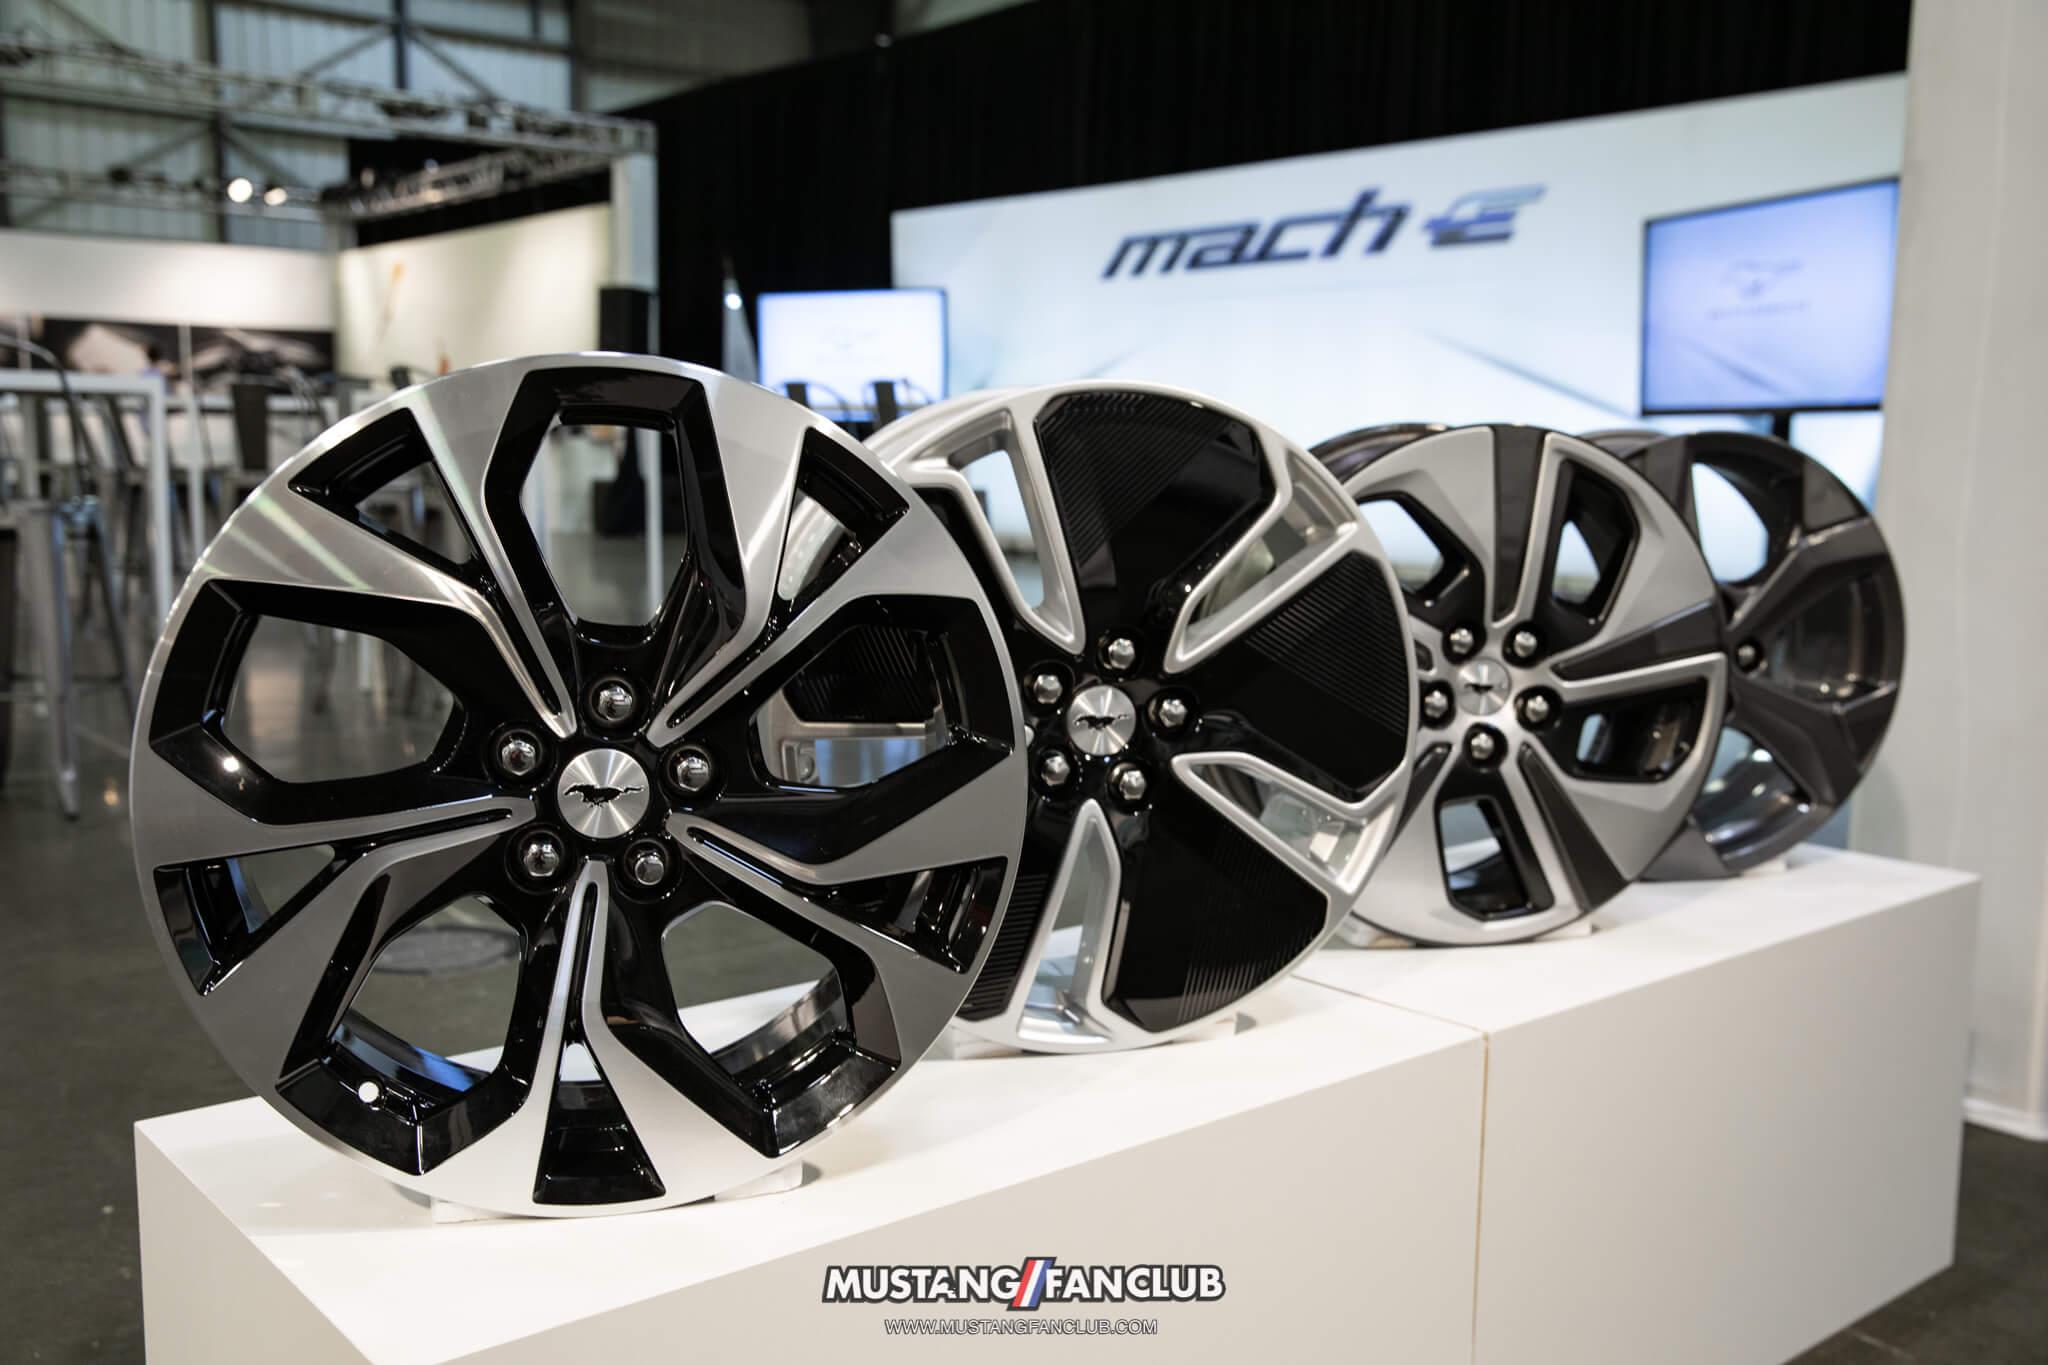 2021 Mach E Wheel Options